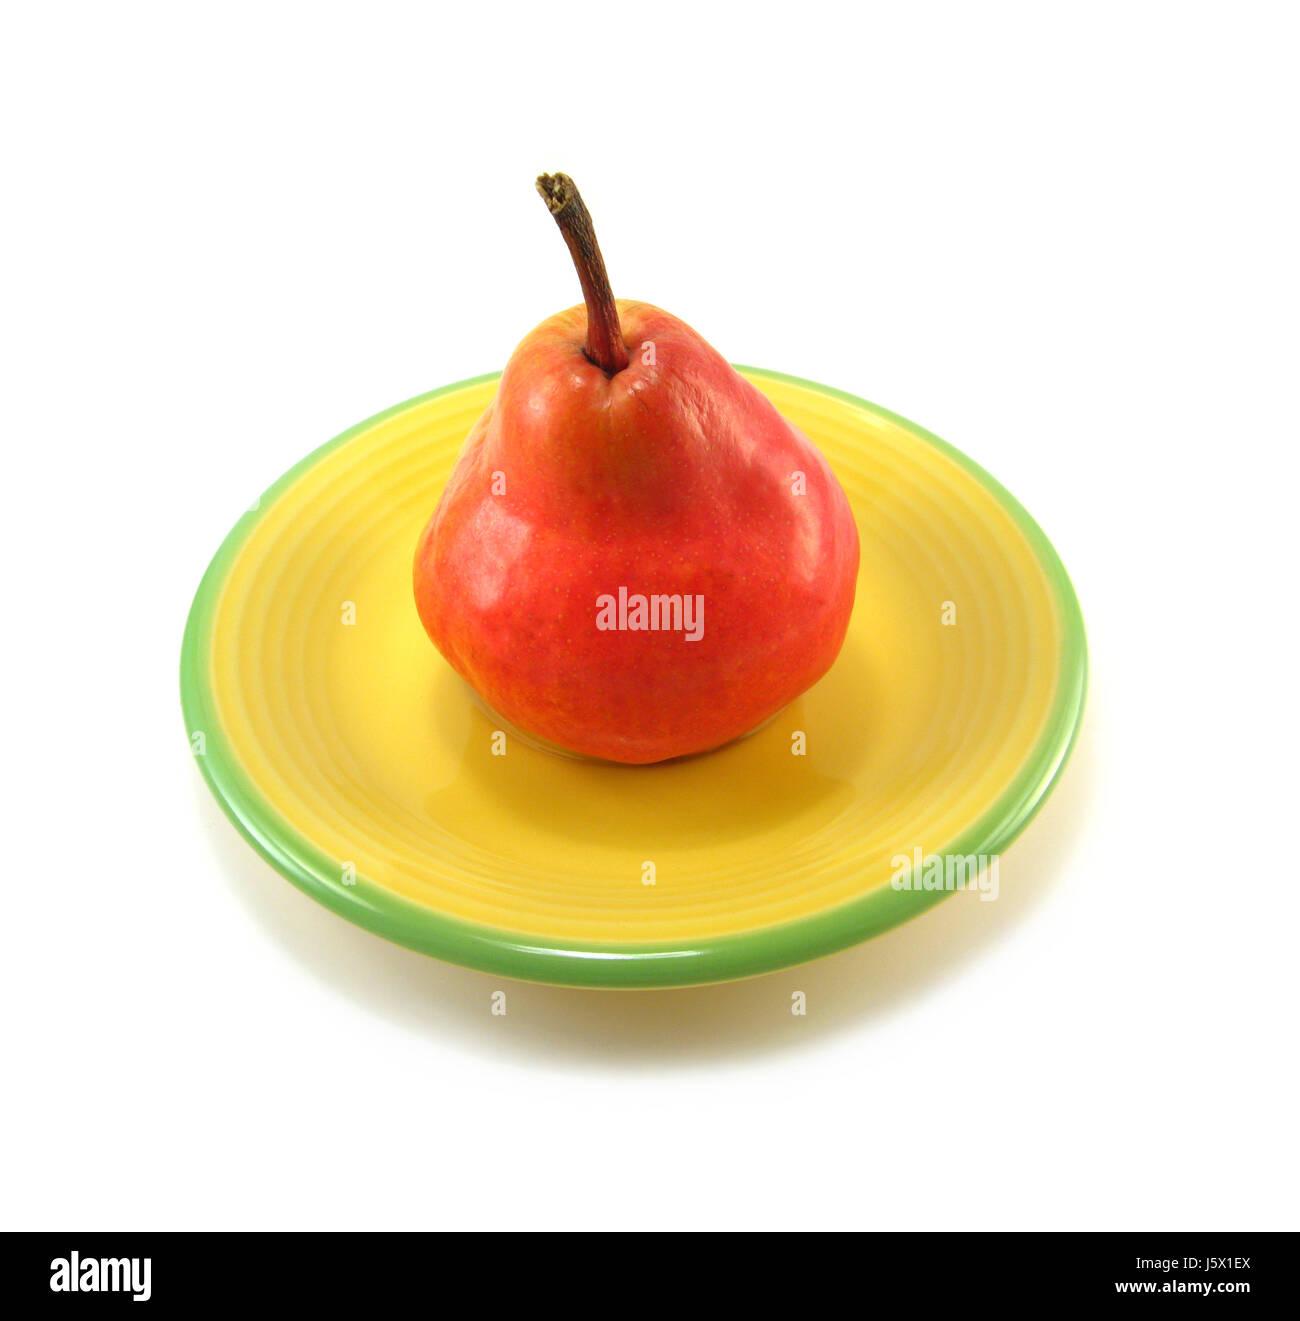 food aliment progenies fruits fruit pear bulb pears food aliment health Stock Photo